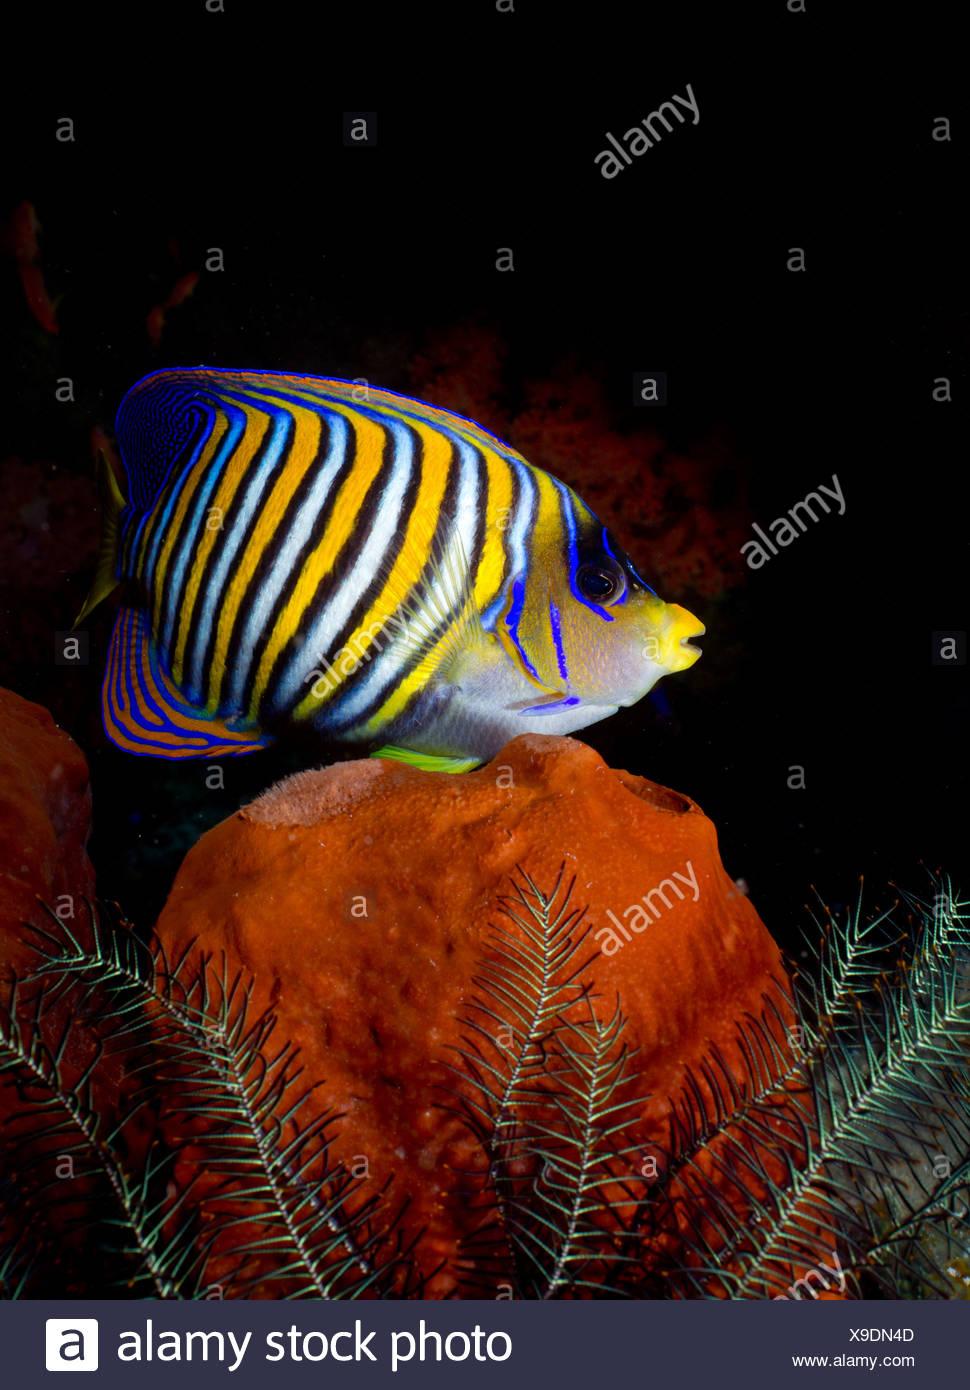 Regal angelfish on coral reef - Stock Image